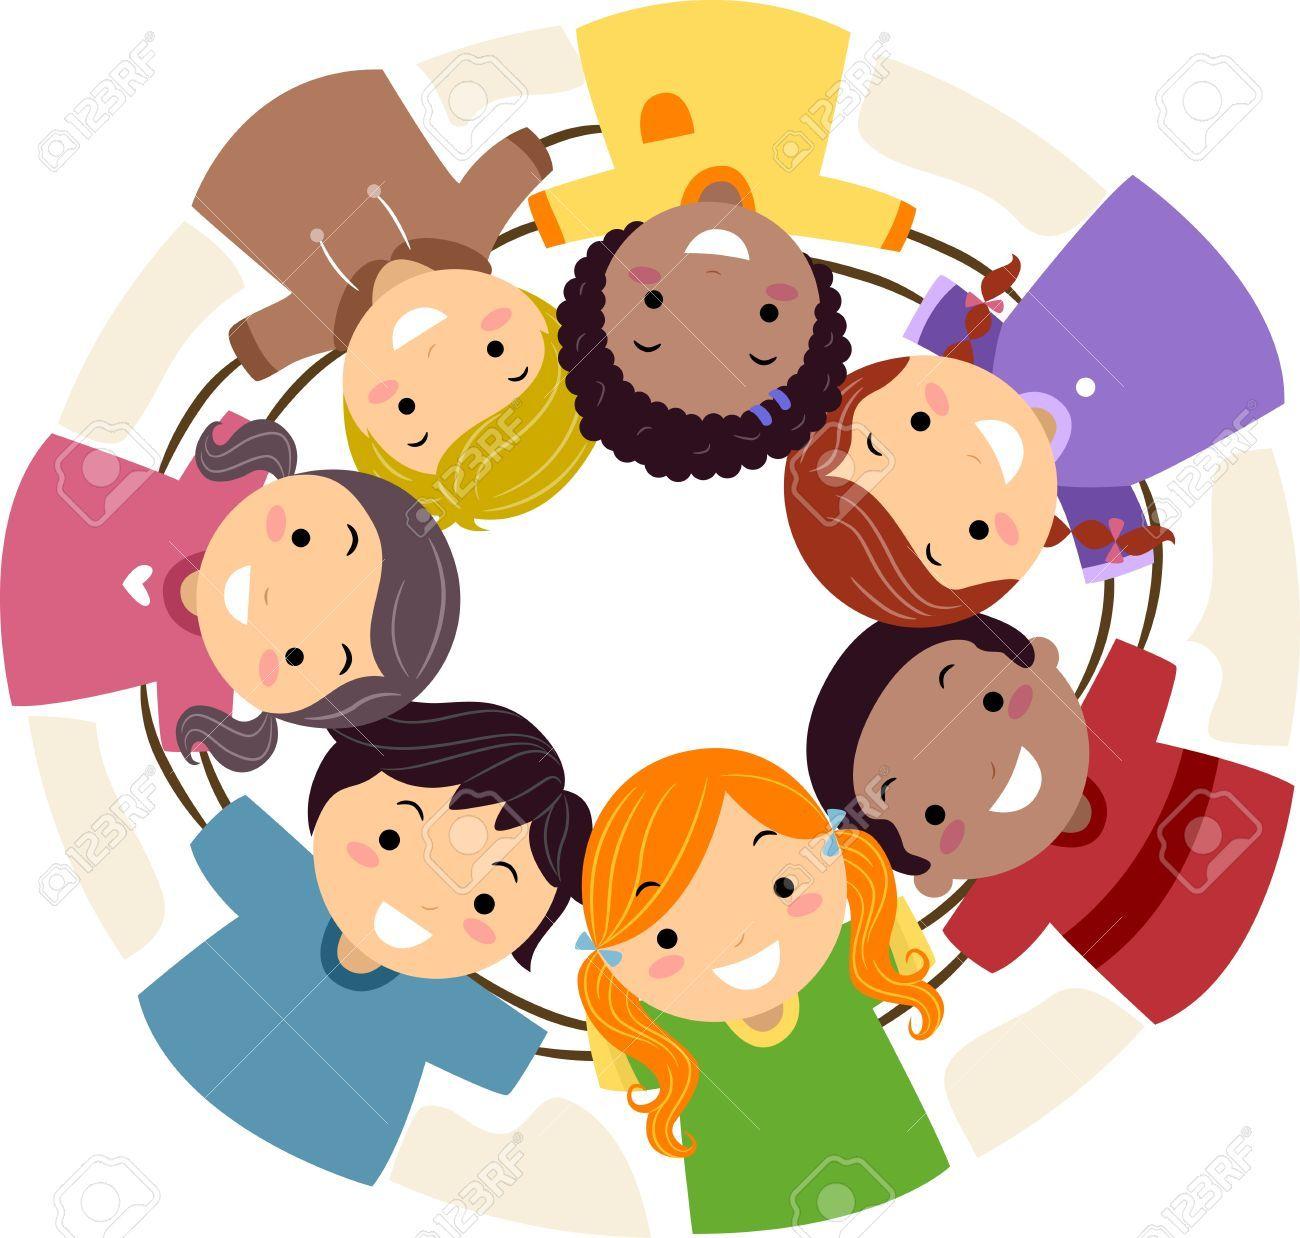 funny friends group cartoon | Friend cartoon, Drawing for kids, Best friends cartoon